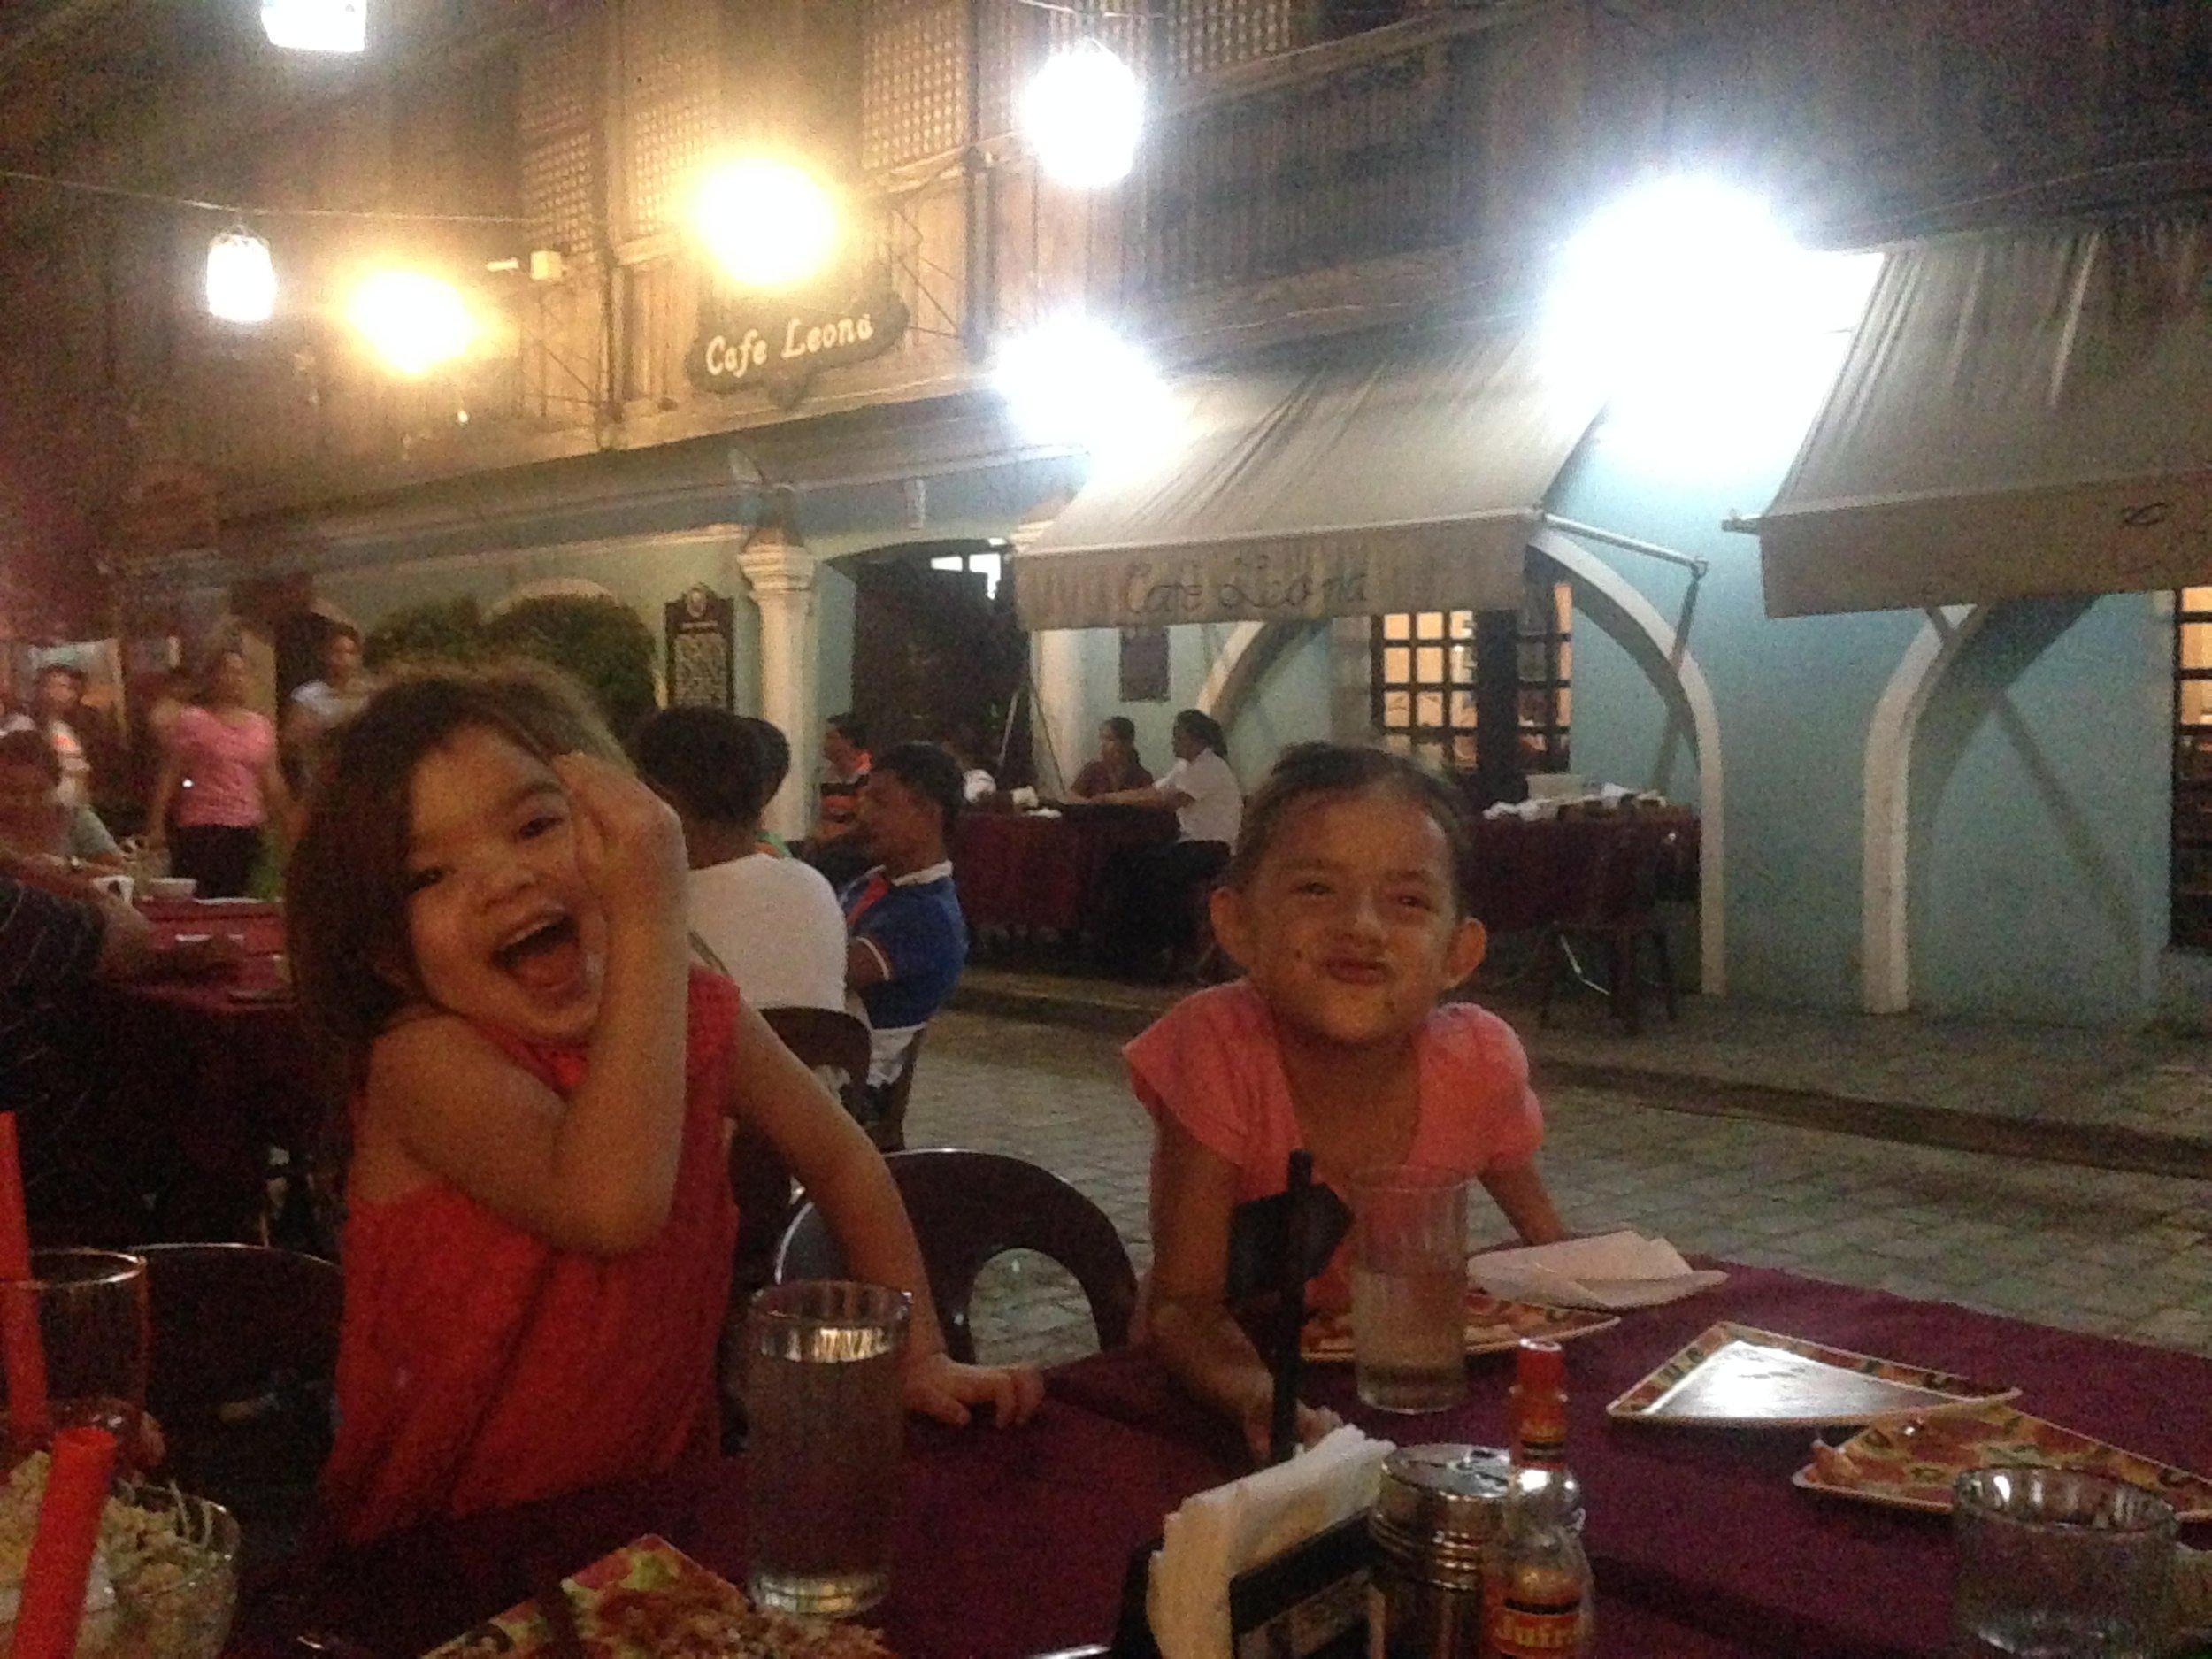 Eating at Cafe Leona